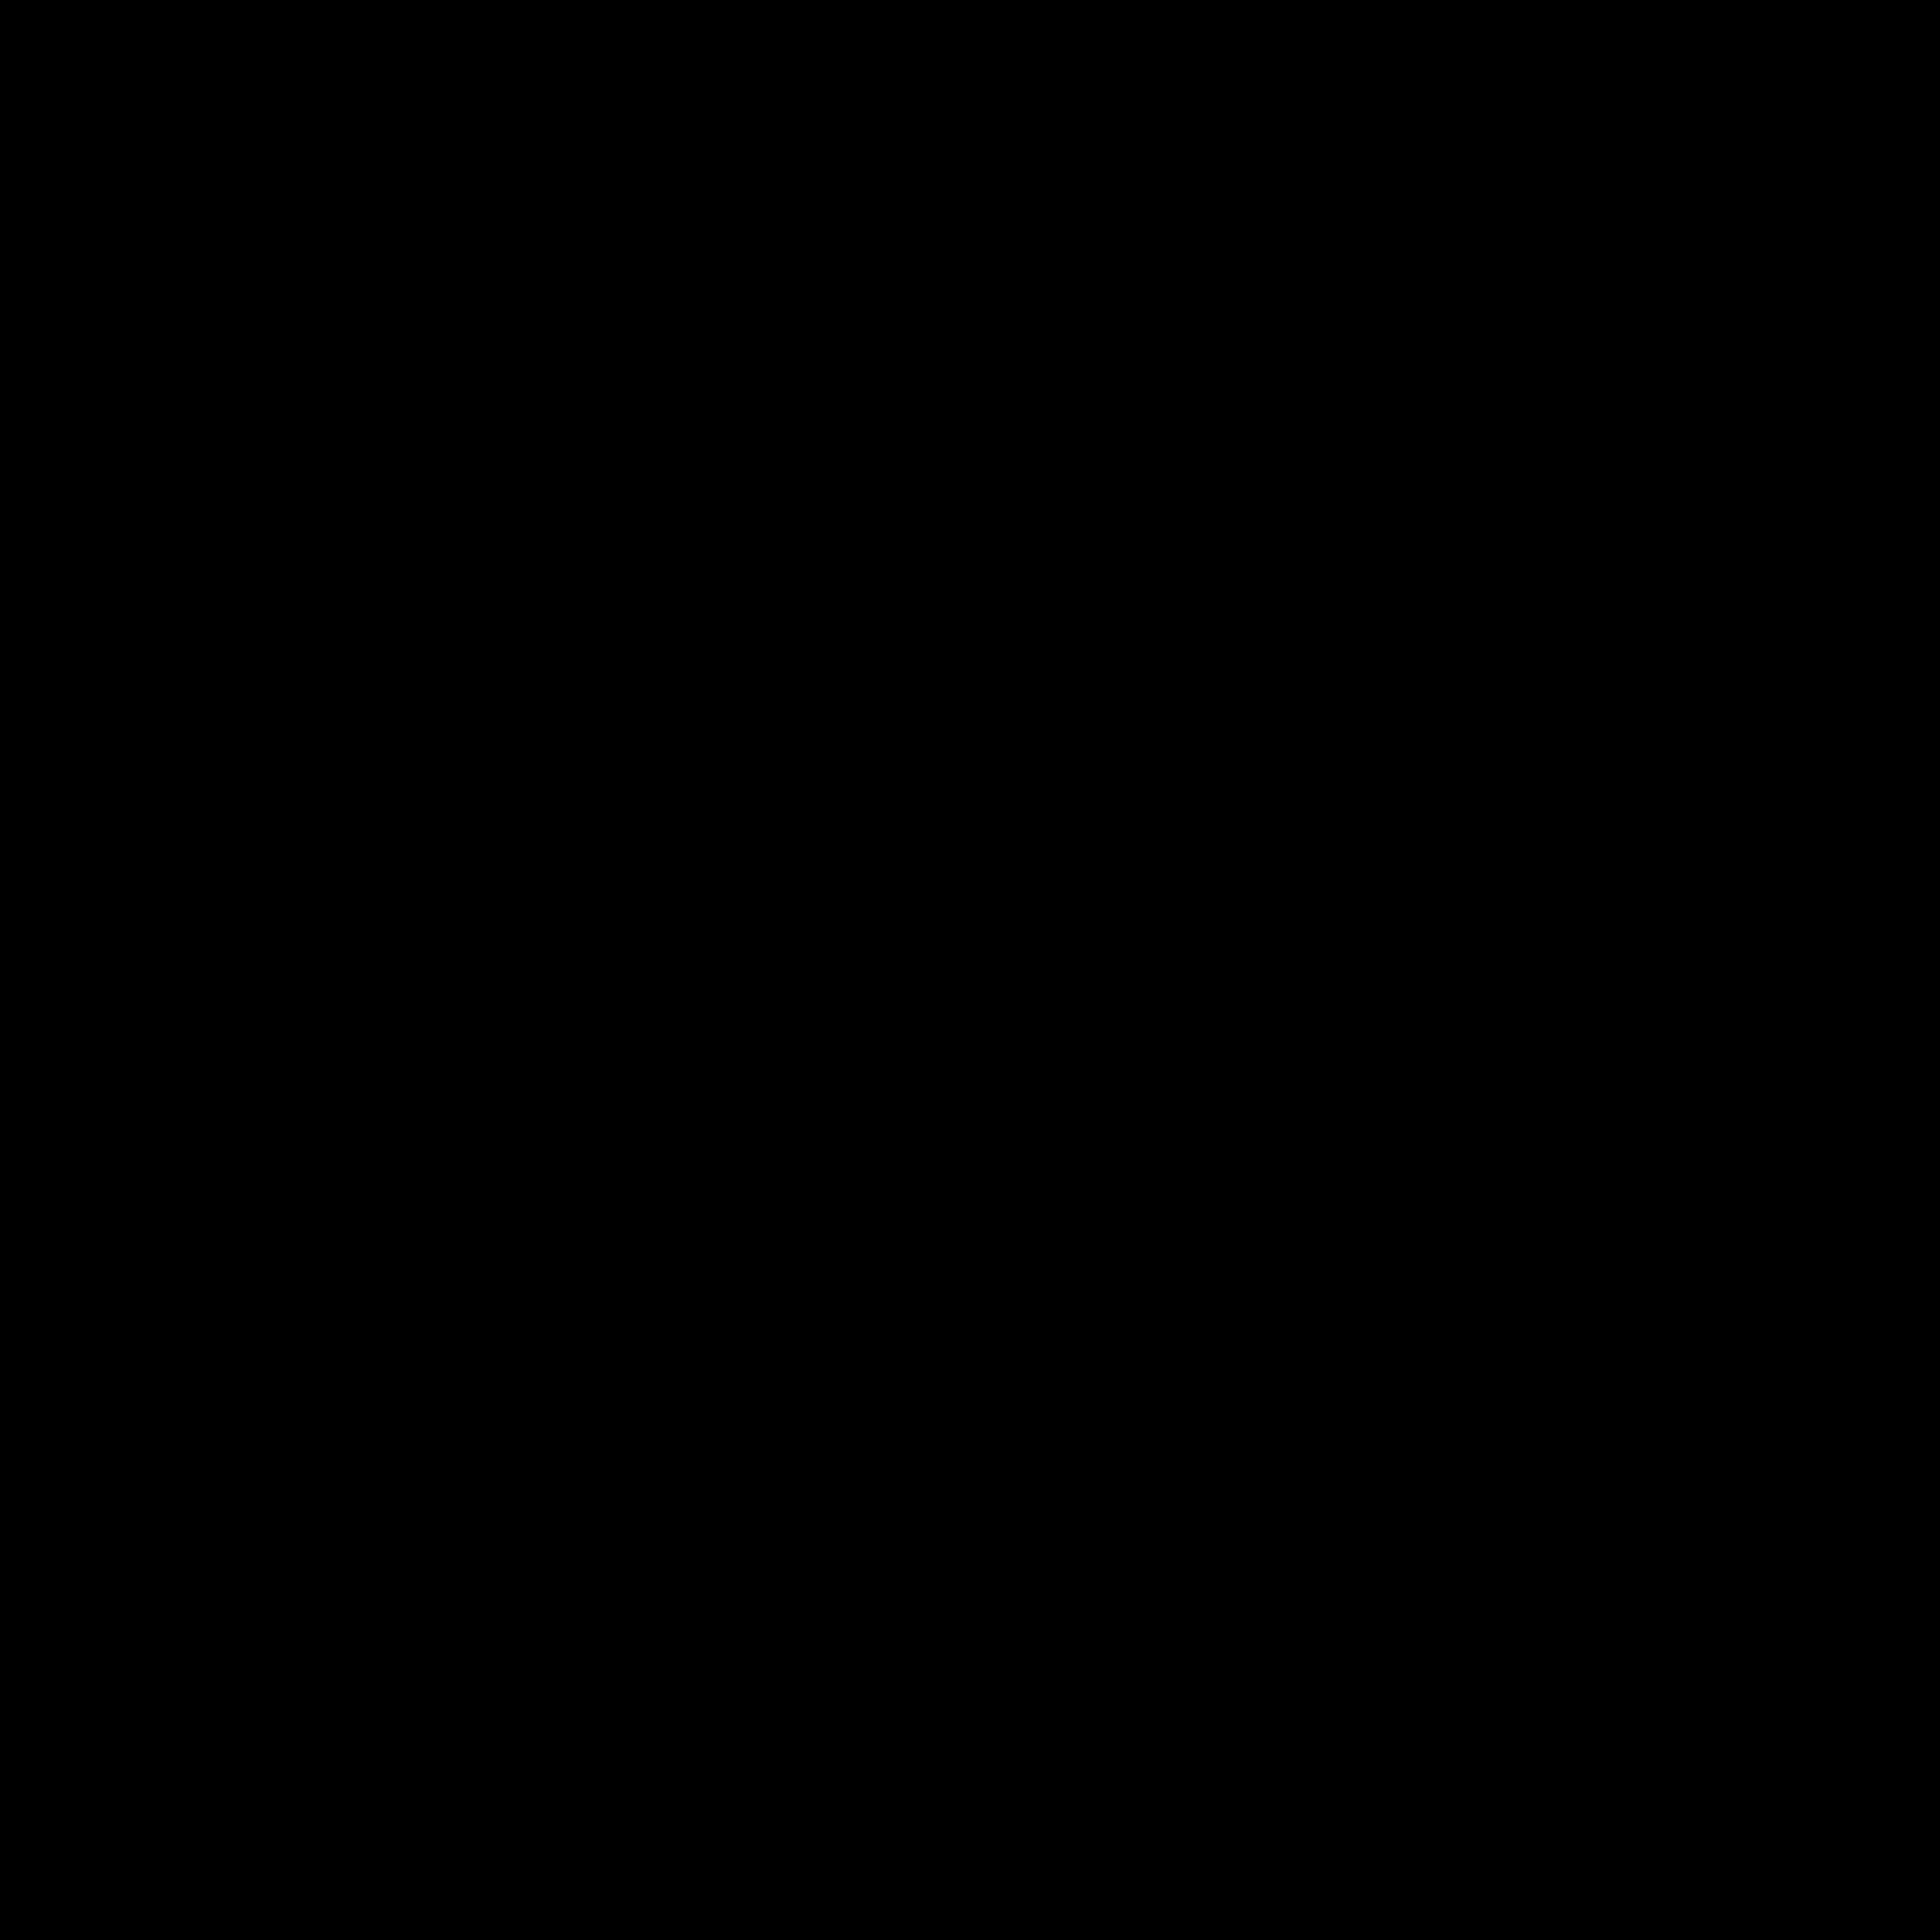 sony-2-logo-png-transparent